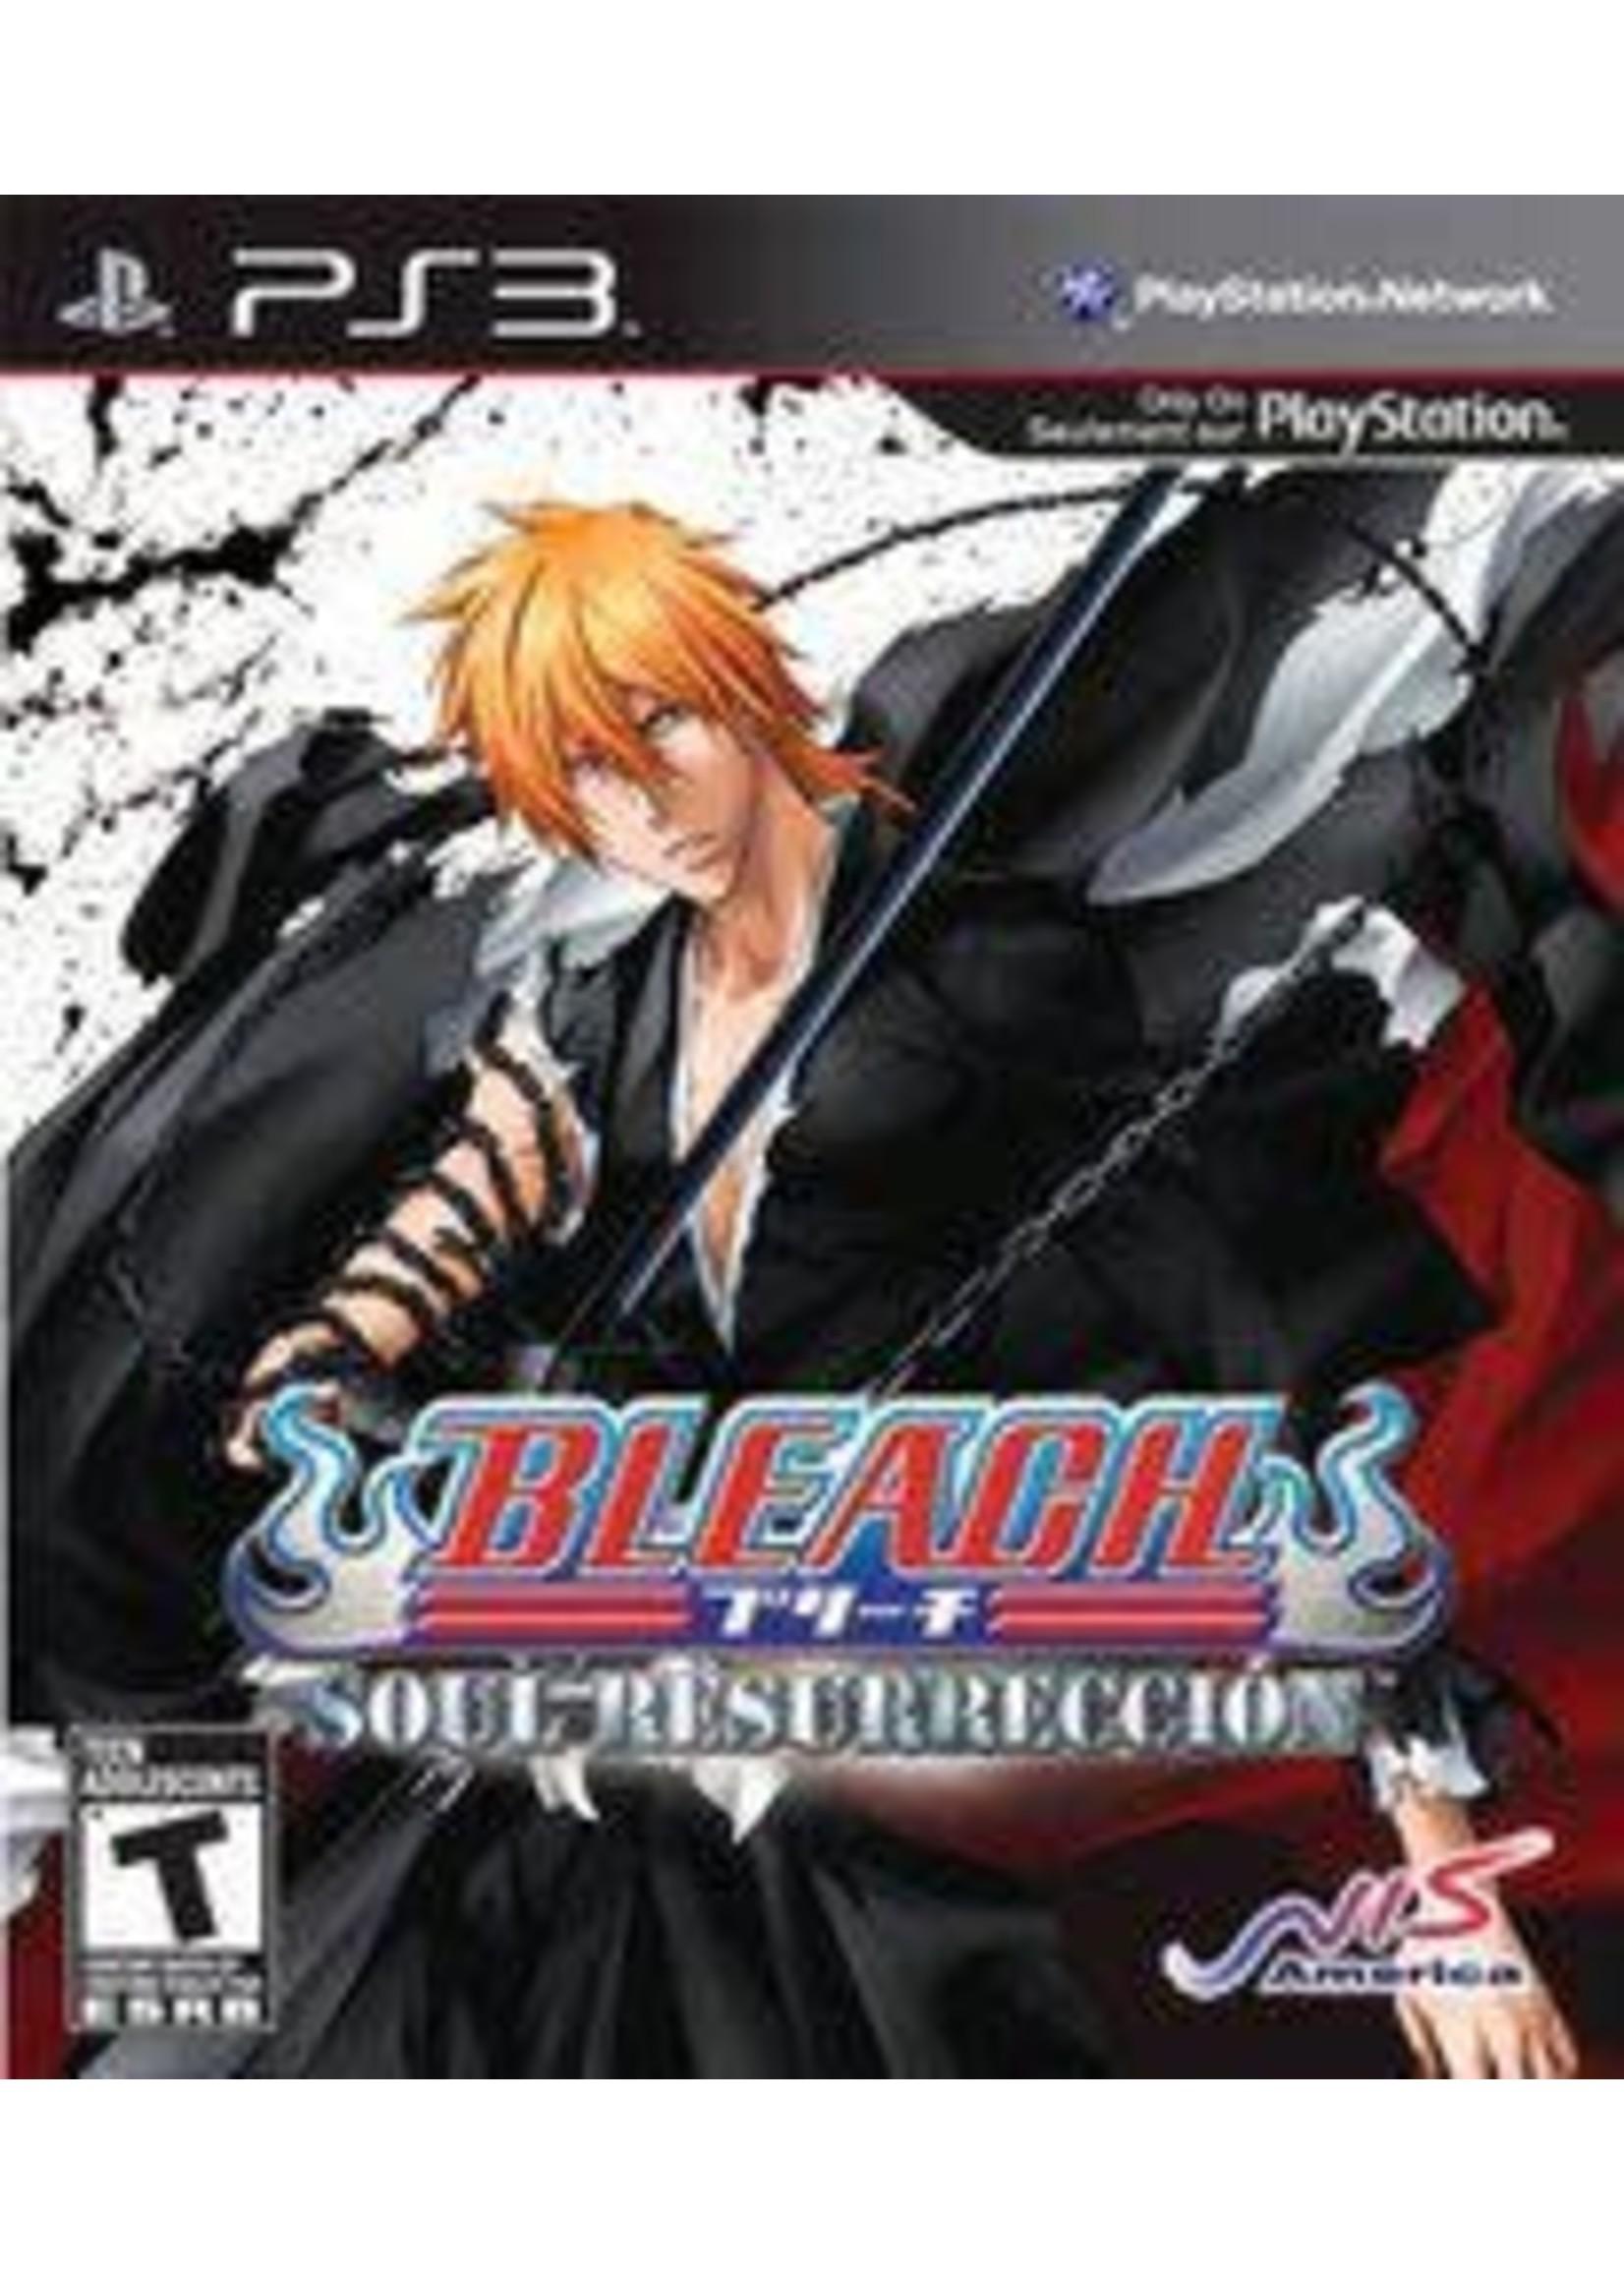 Bleach: Soul Resurreccion Playstation 3